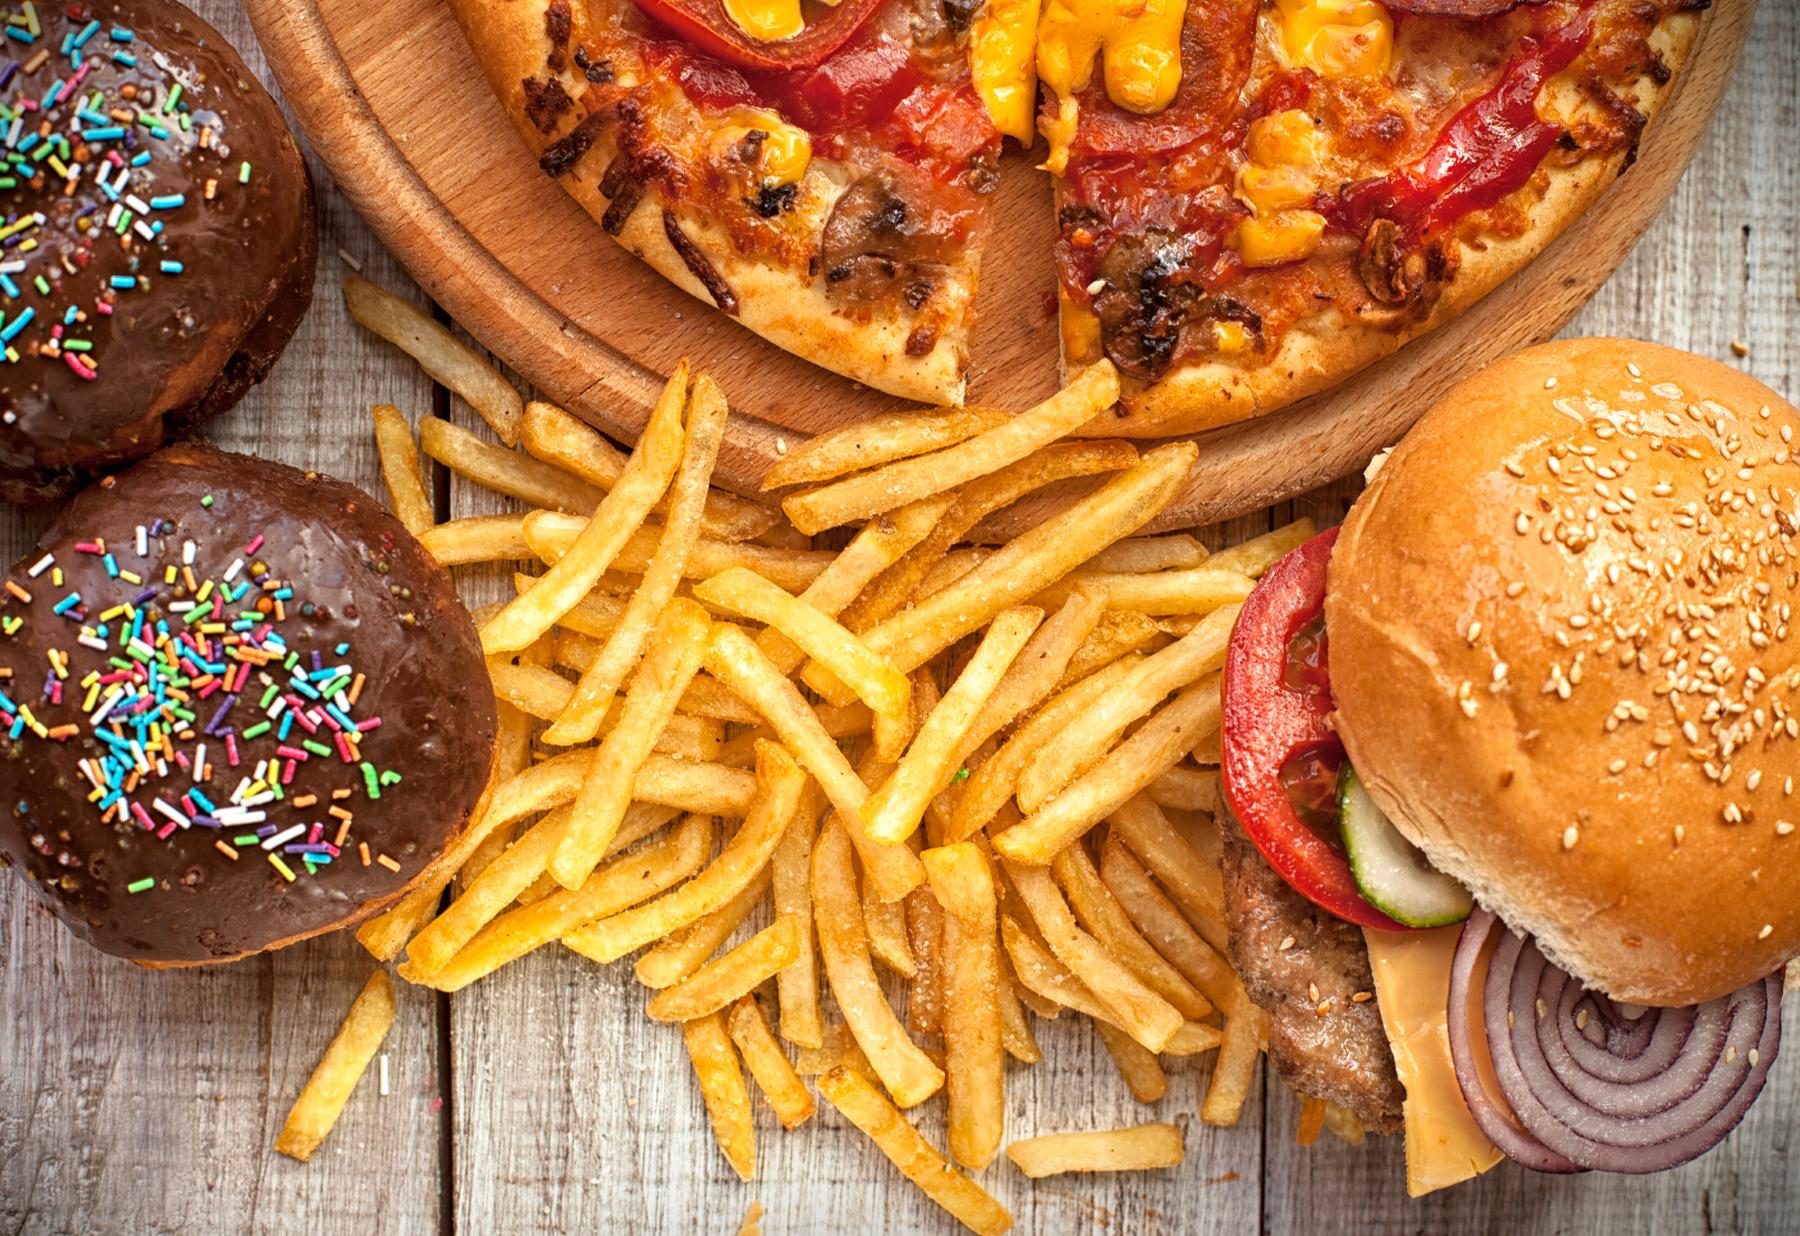 Inilah alasan kenapa orang suka makan junk food